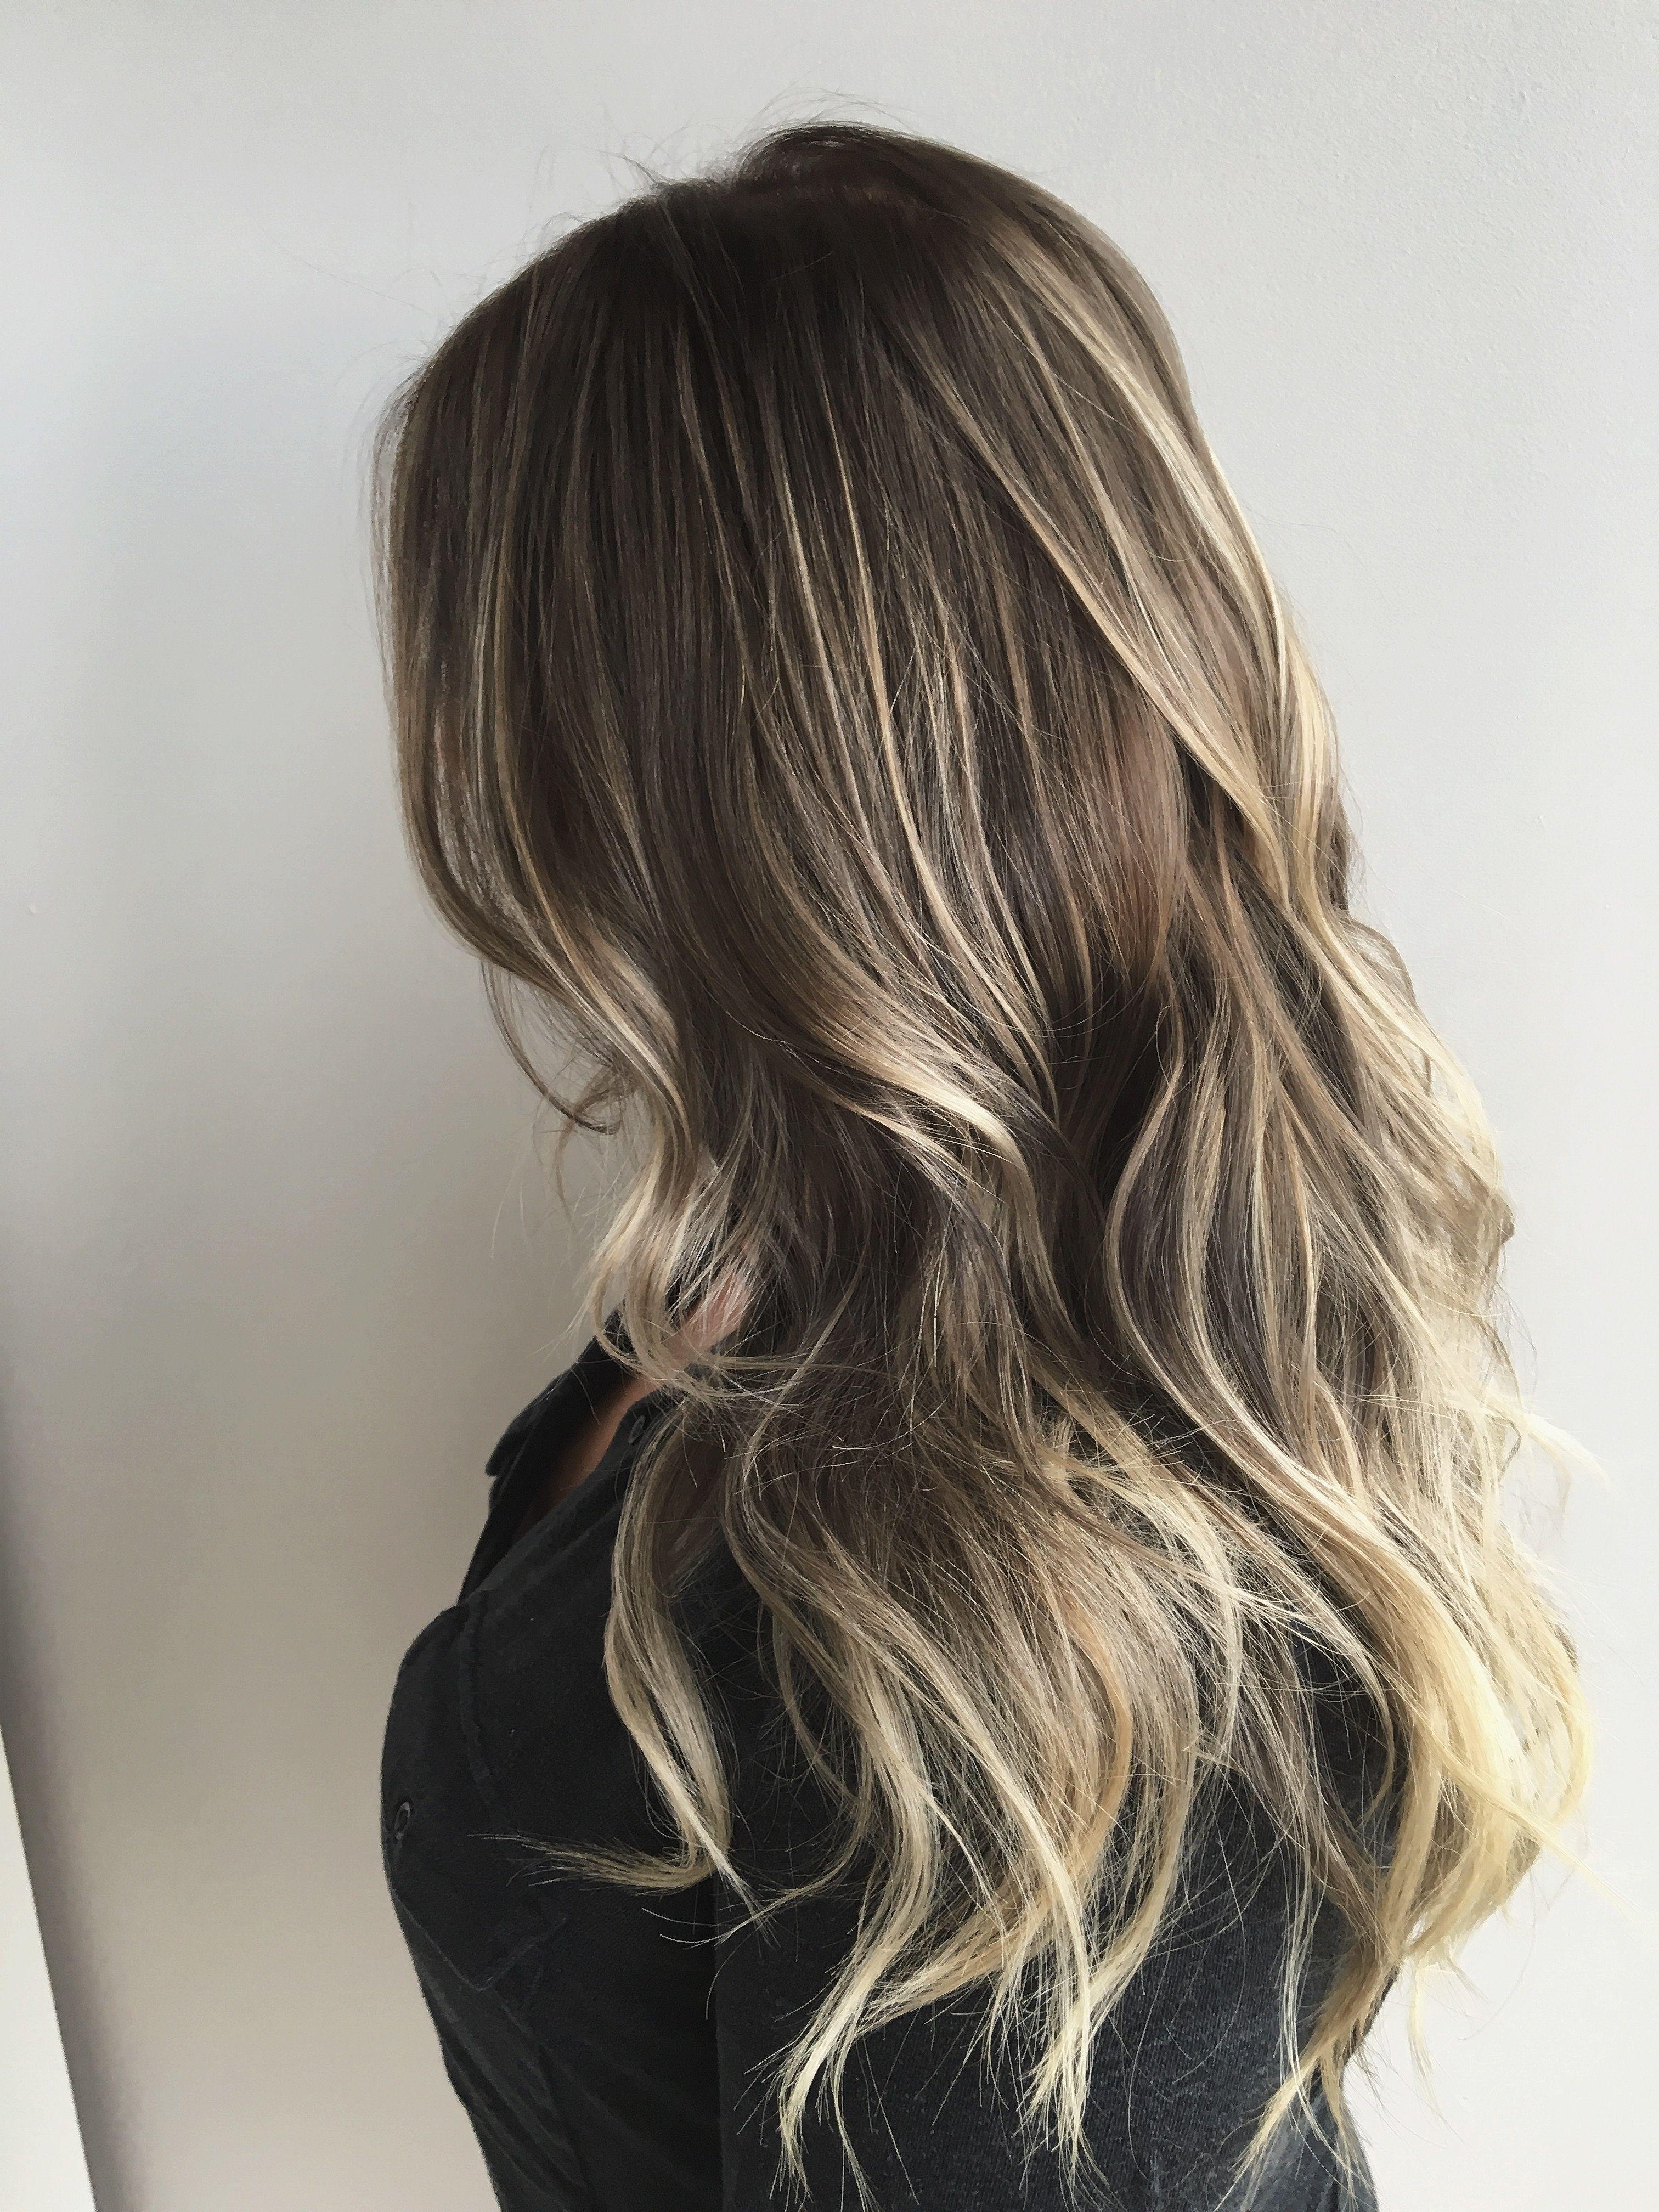 Dark brown hair with blonde. Dimensional brunette. Dark blonde hair. Long blonde hair. Extention hairstyles. Balayage on blonde hair. Blonde hair with lowlights.